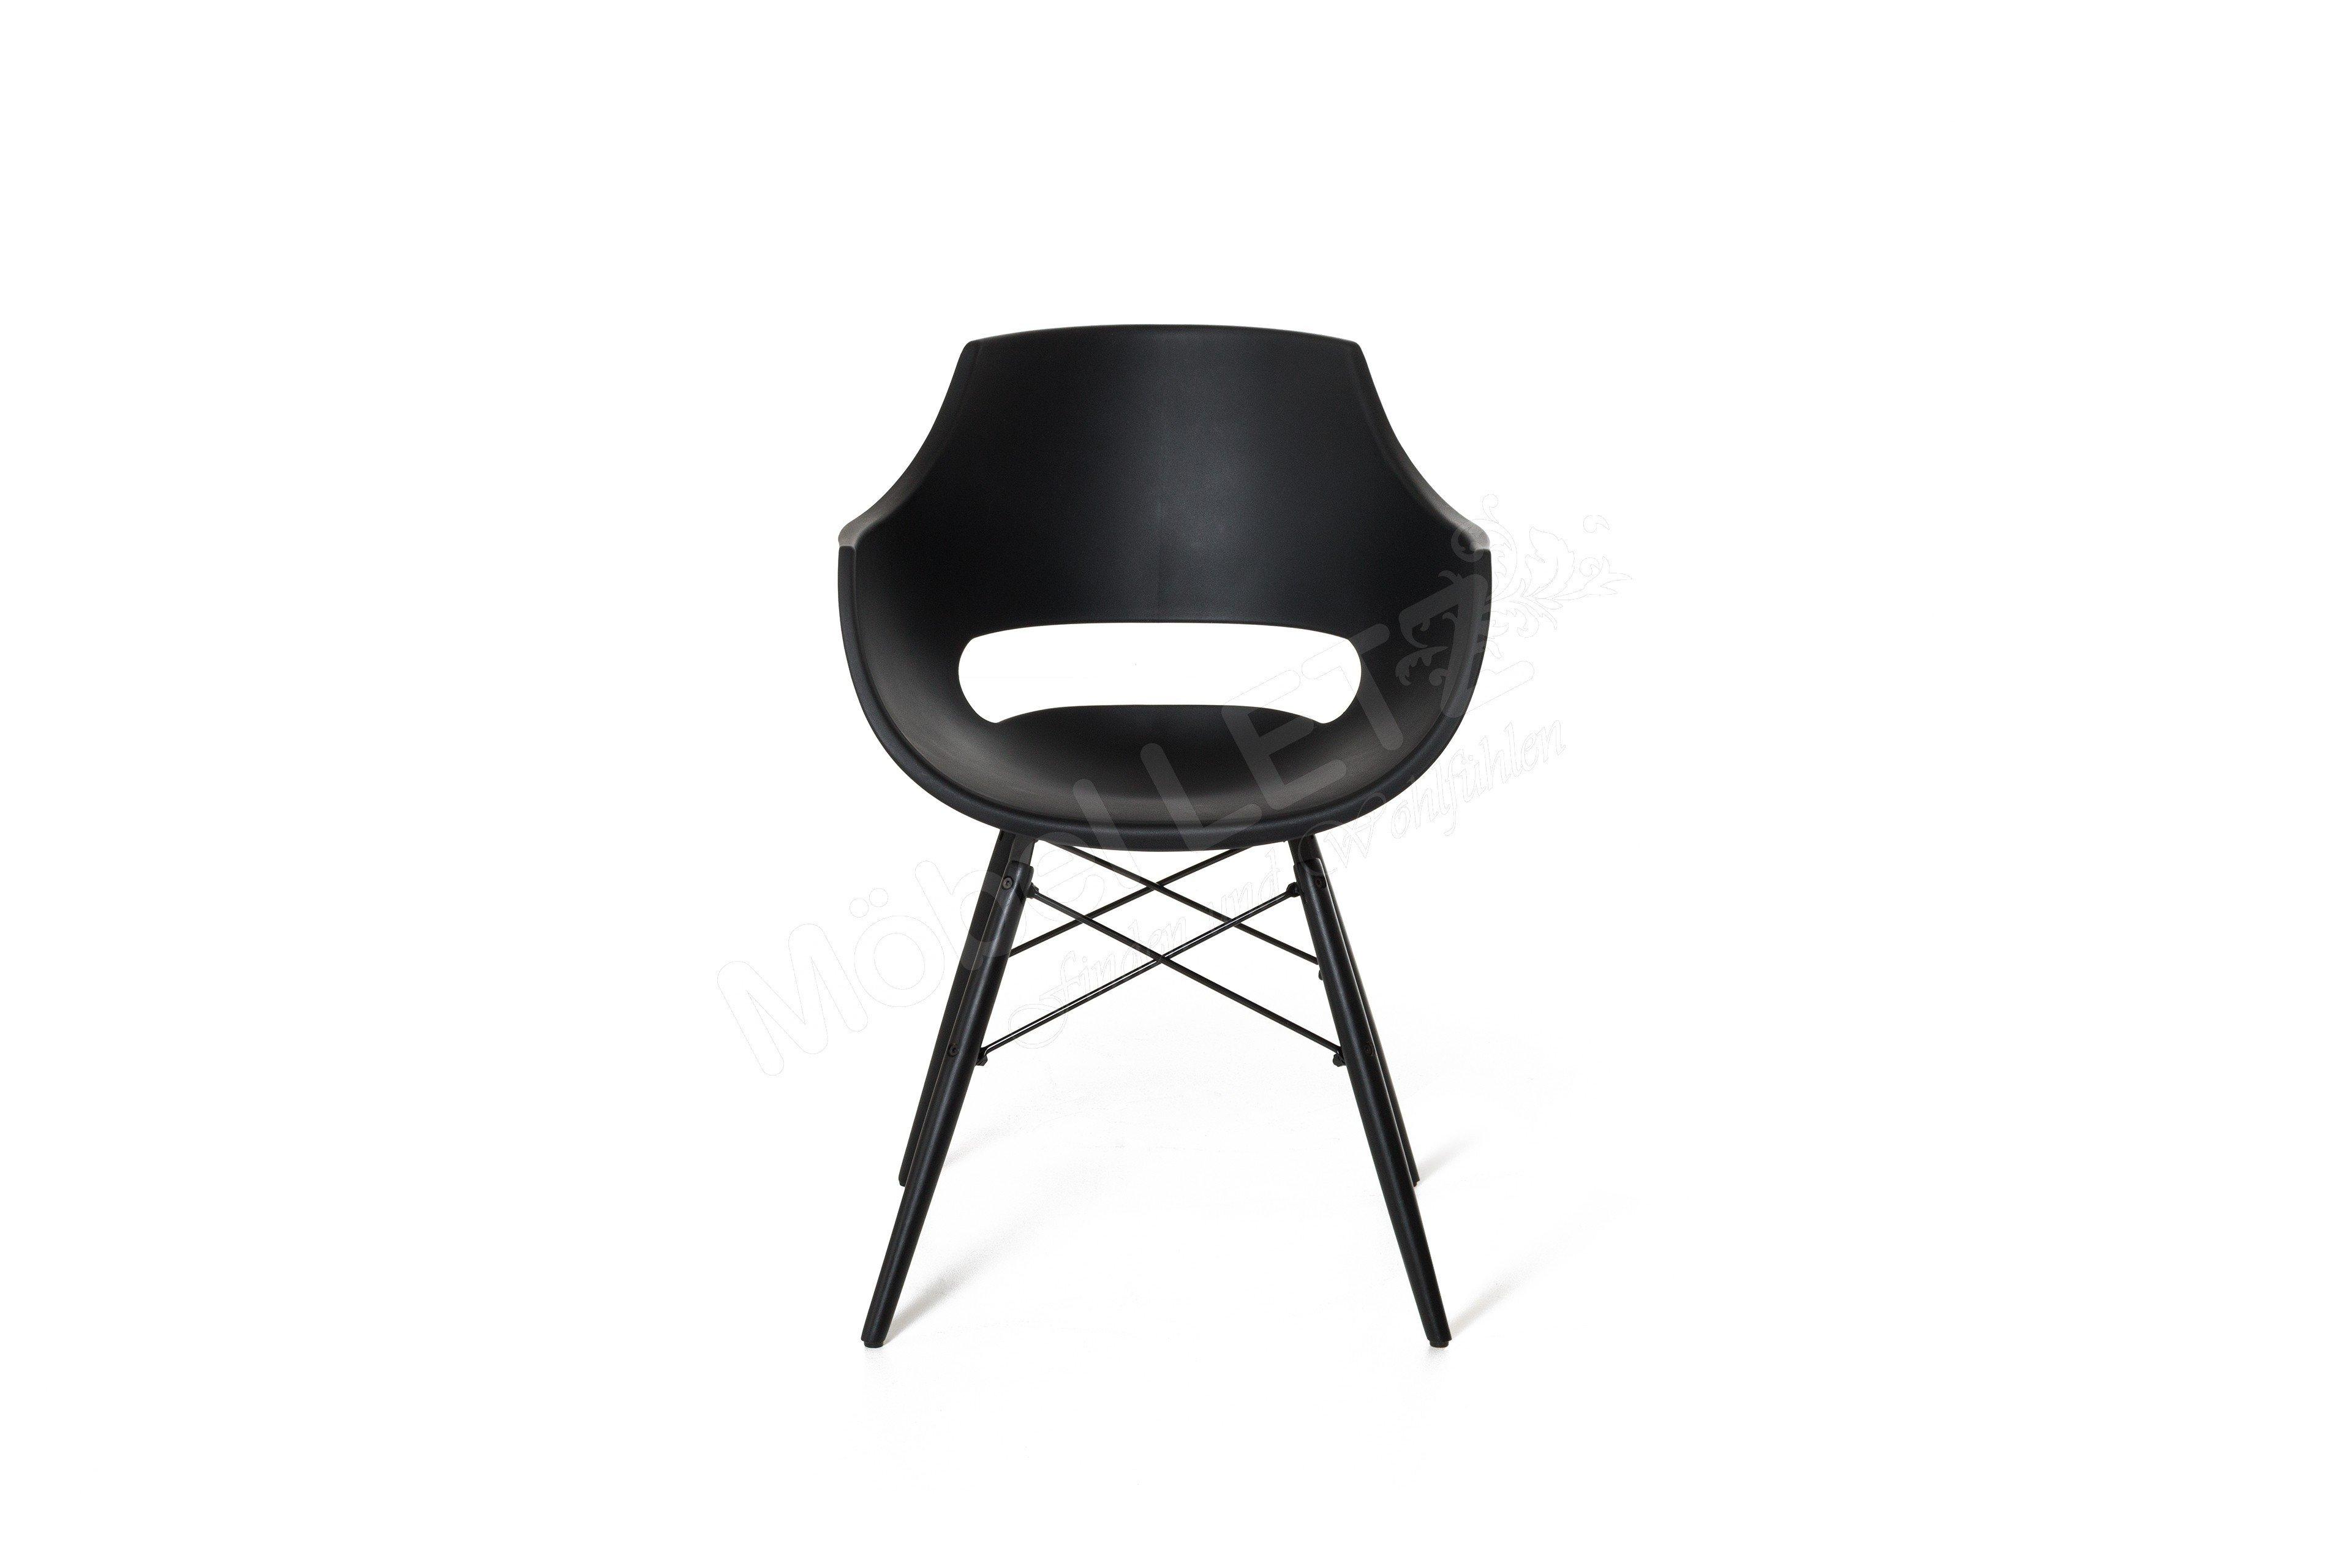 Sthle Kunststoff Top Excellent Stuhl Sthle Joe Colombo Plastik